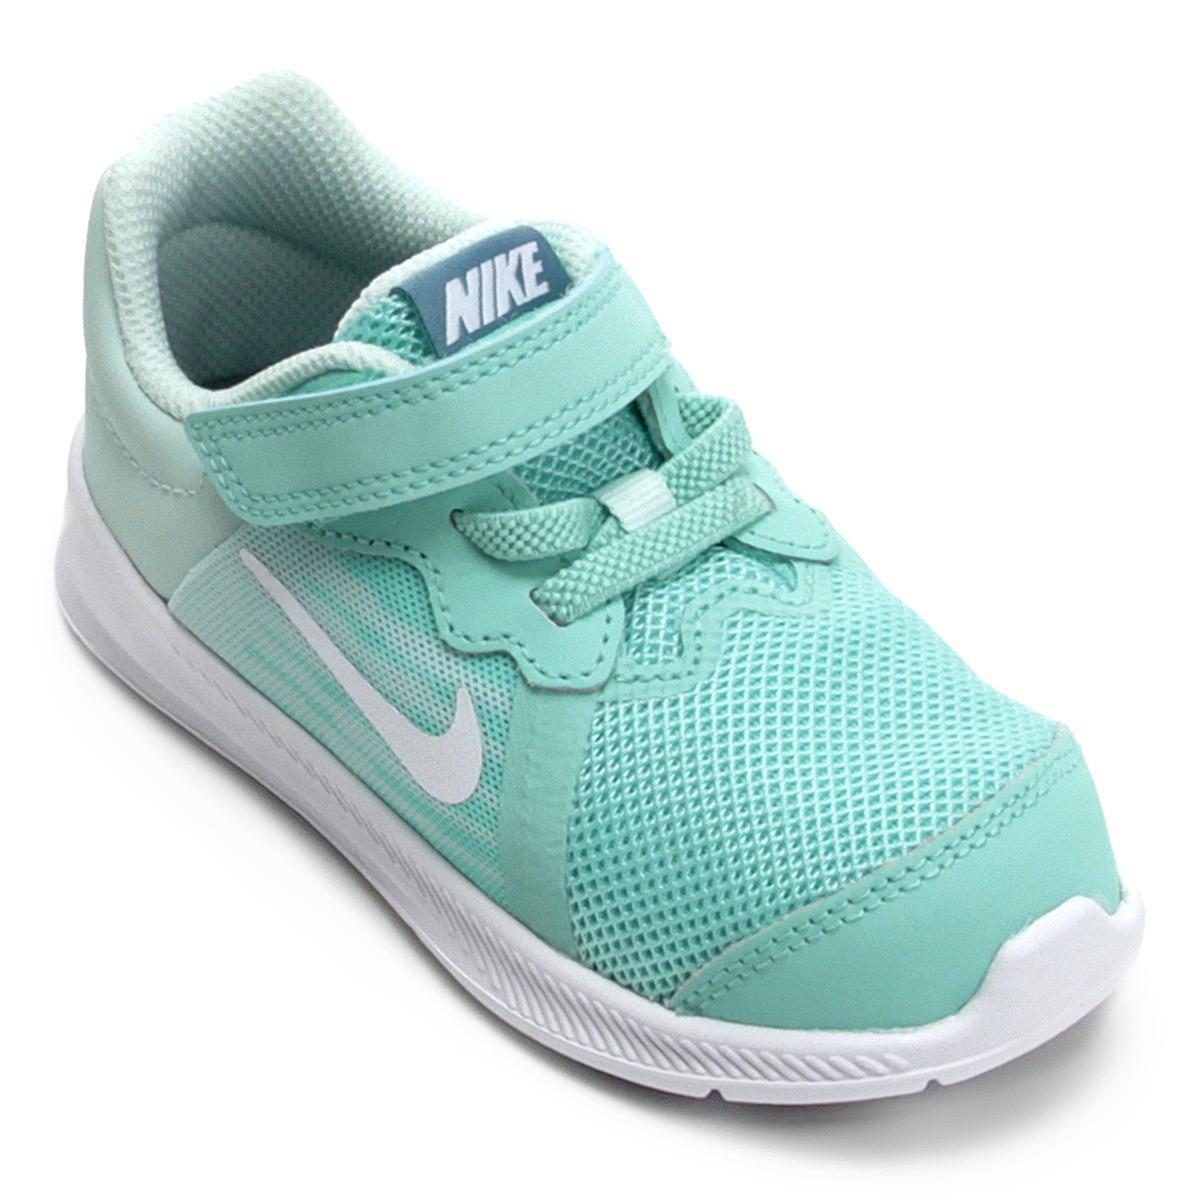 54092f3268f Shopping Smiles - Tênis Infantil Nike Downshifter 8 Gtv Com Velcro Feminino